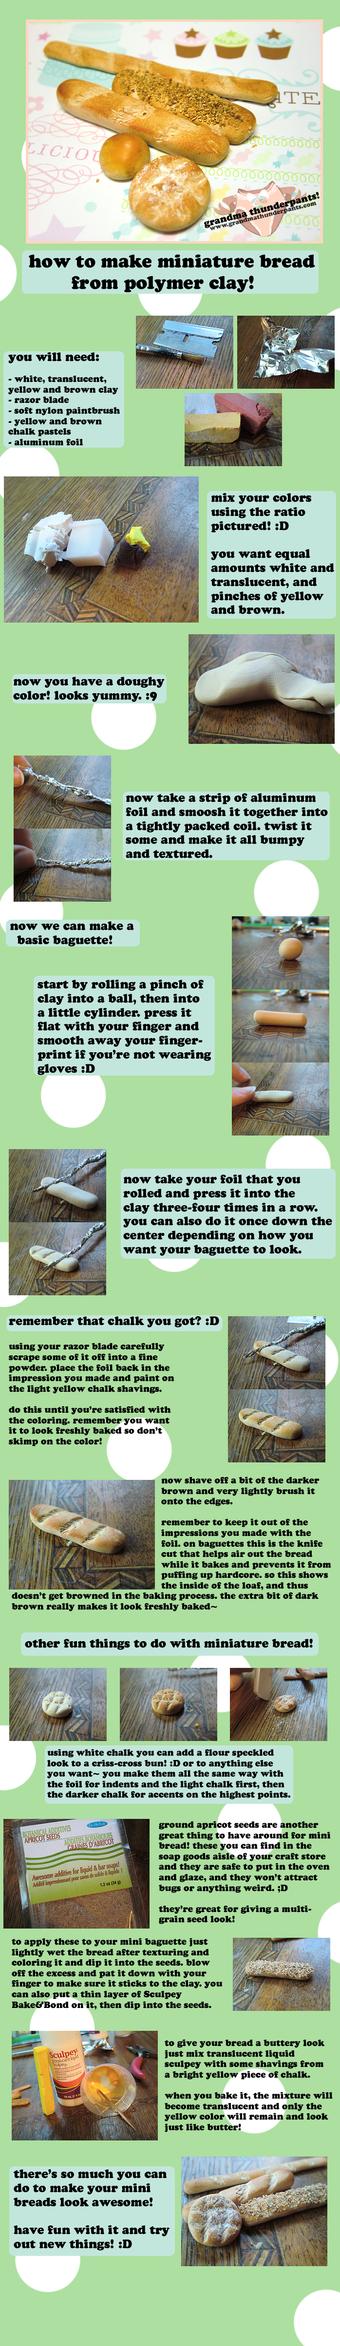 Miniature Clay Bread TUTORIAL by GrandmaThunderpants